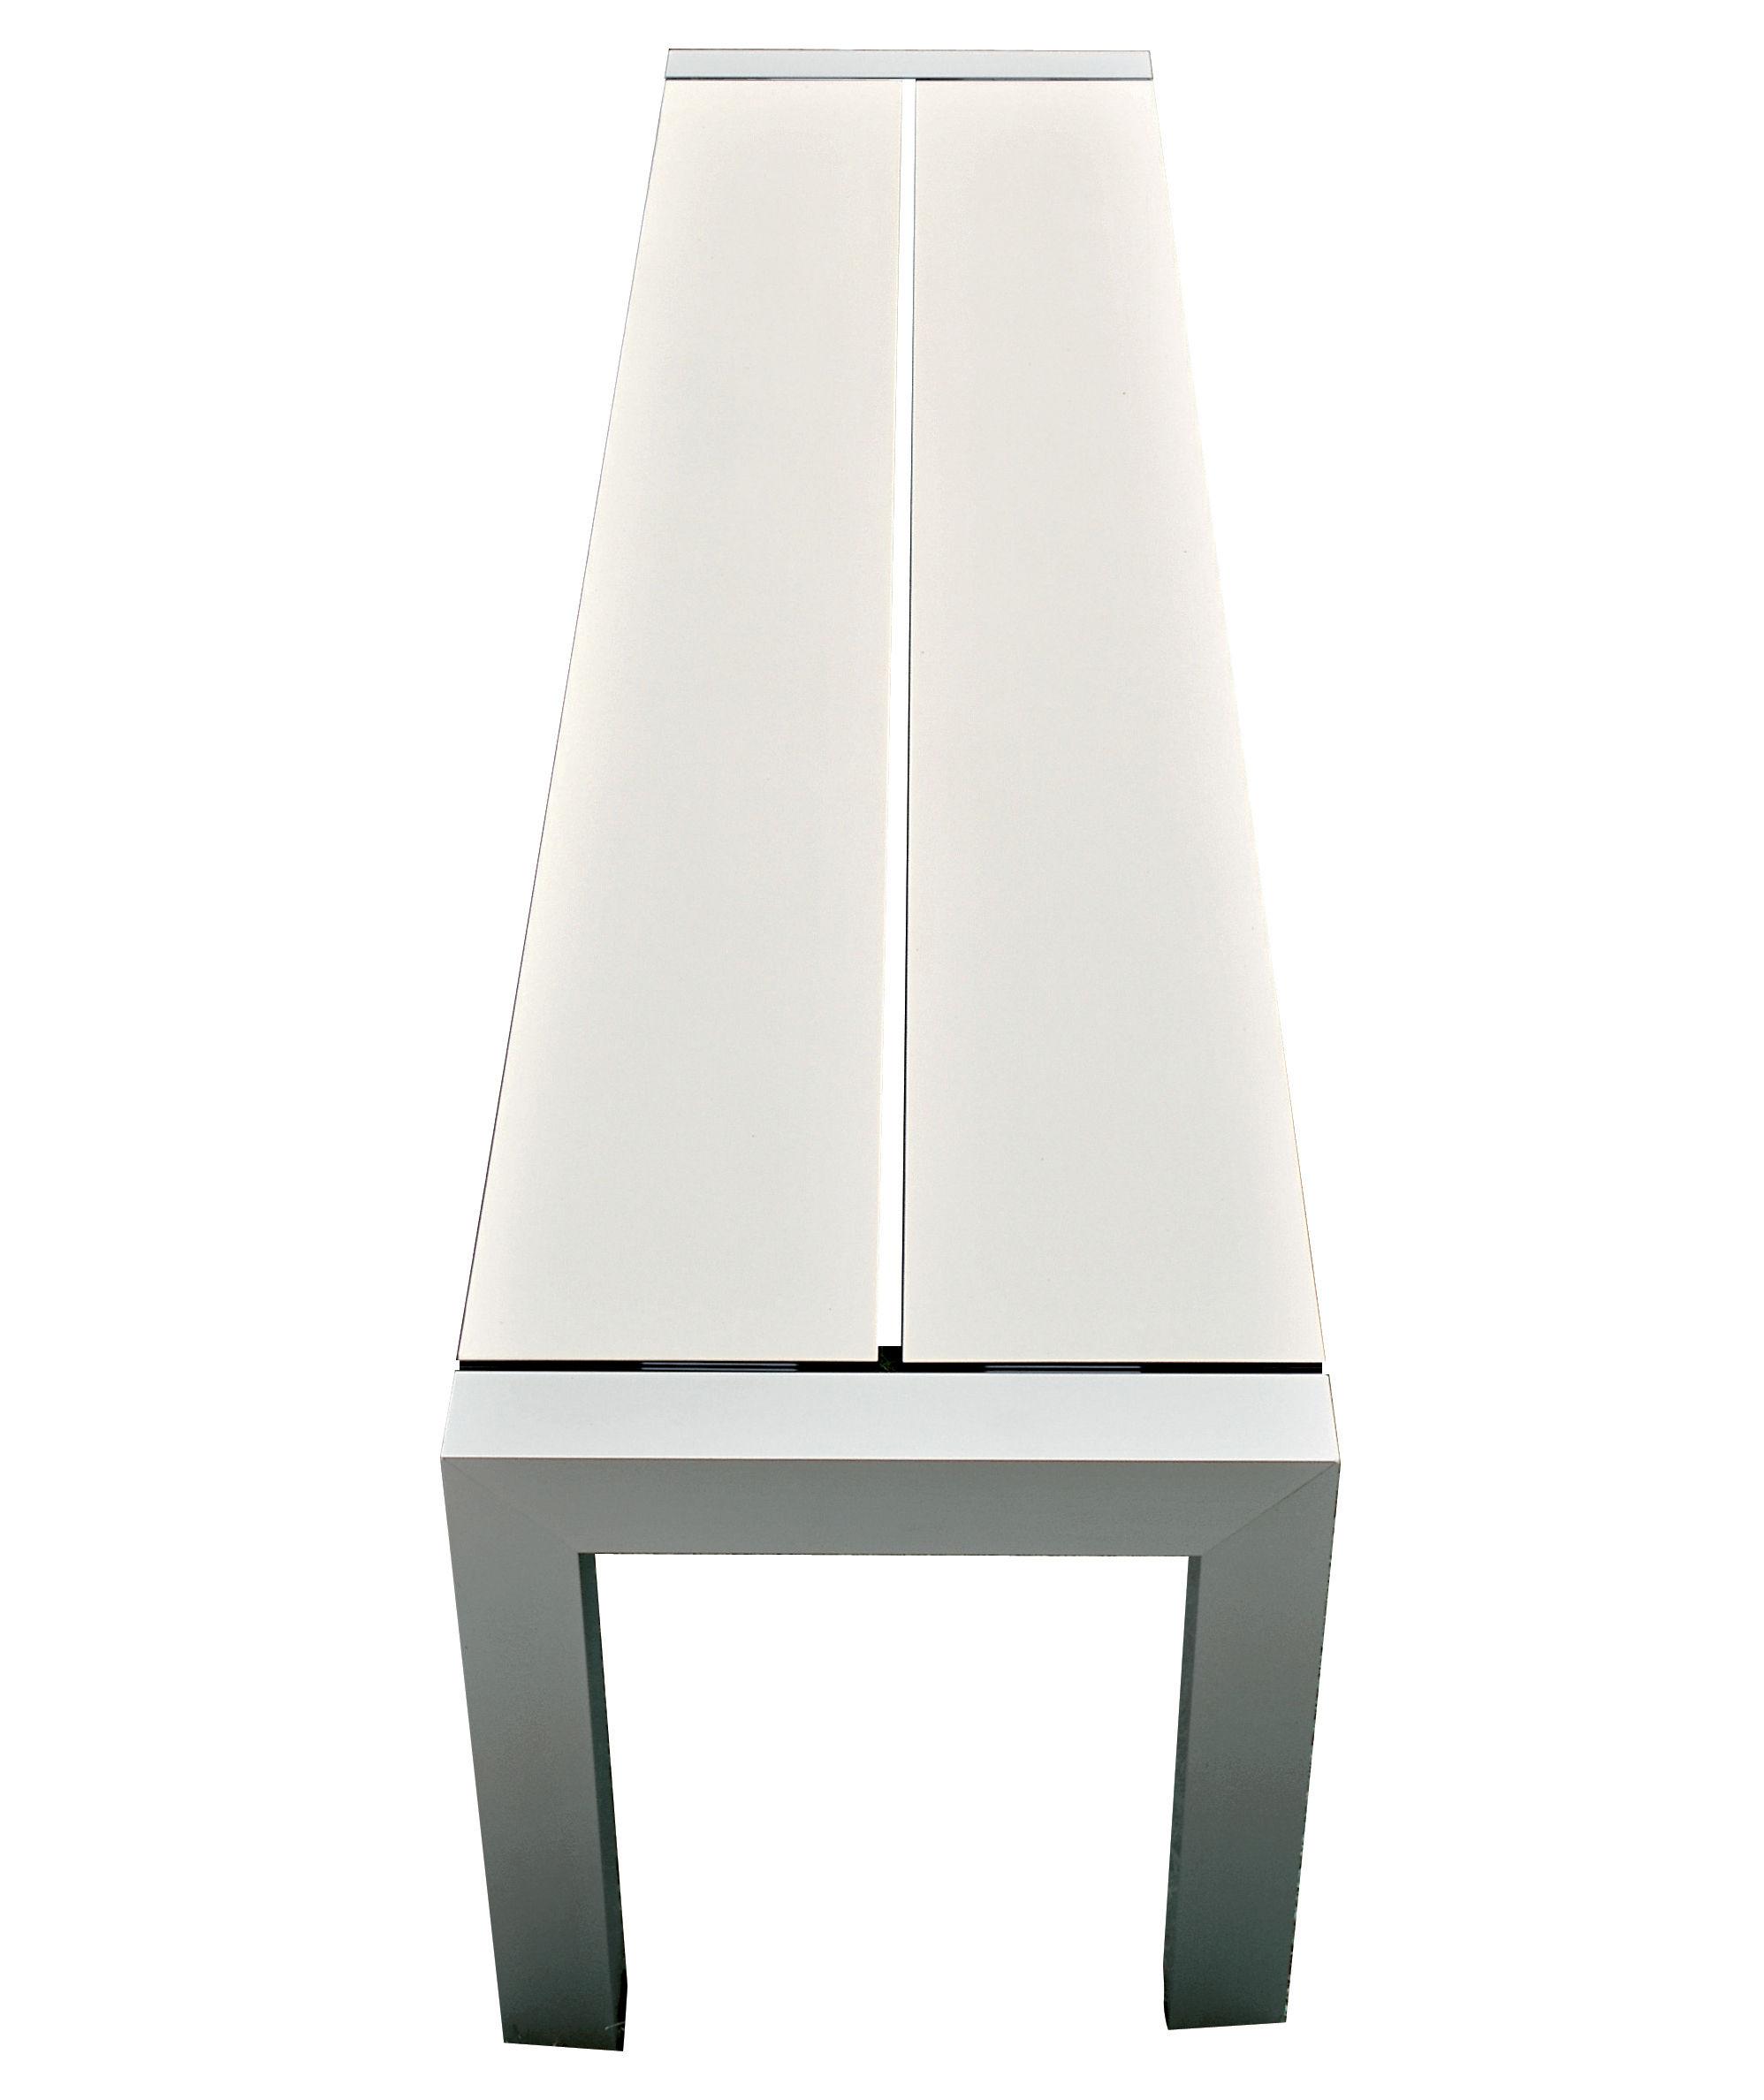 Furniture - Benches - Sushi Bench - L 162 cm by Kristalia - White / Anodized alu - Anodized aluminium, Fenix-NTM® thermo-laminate